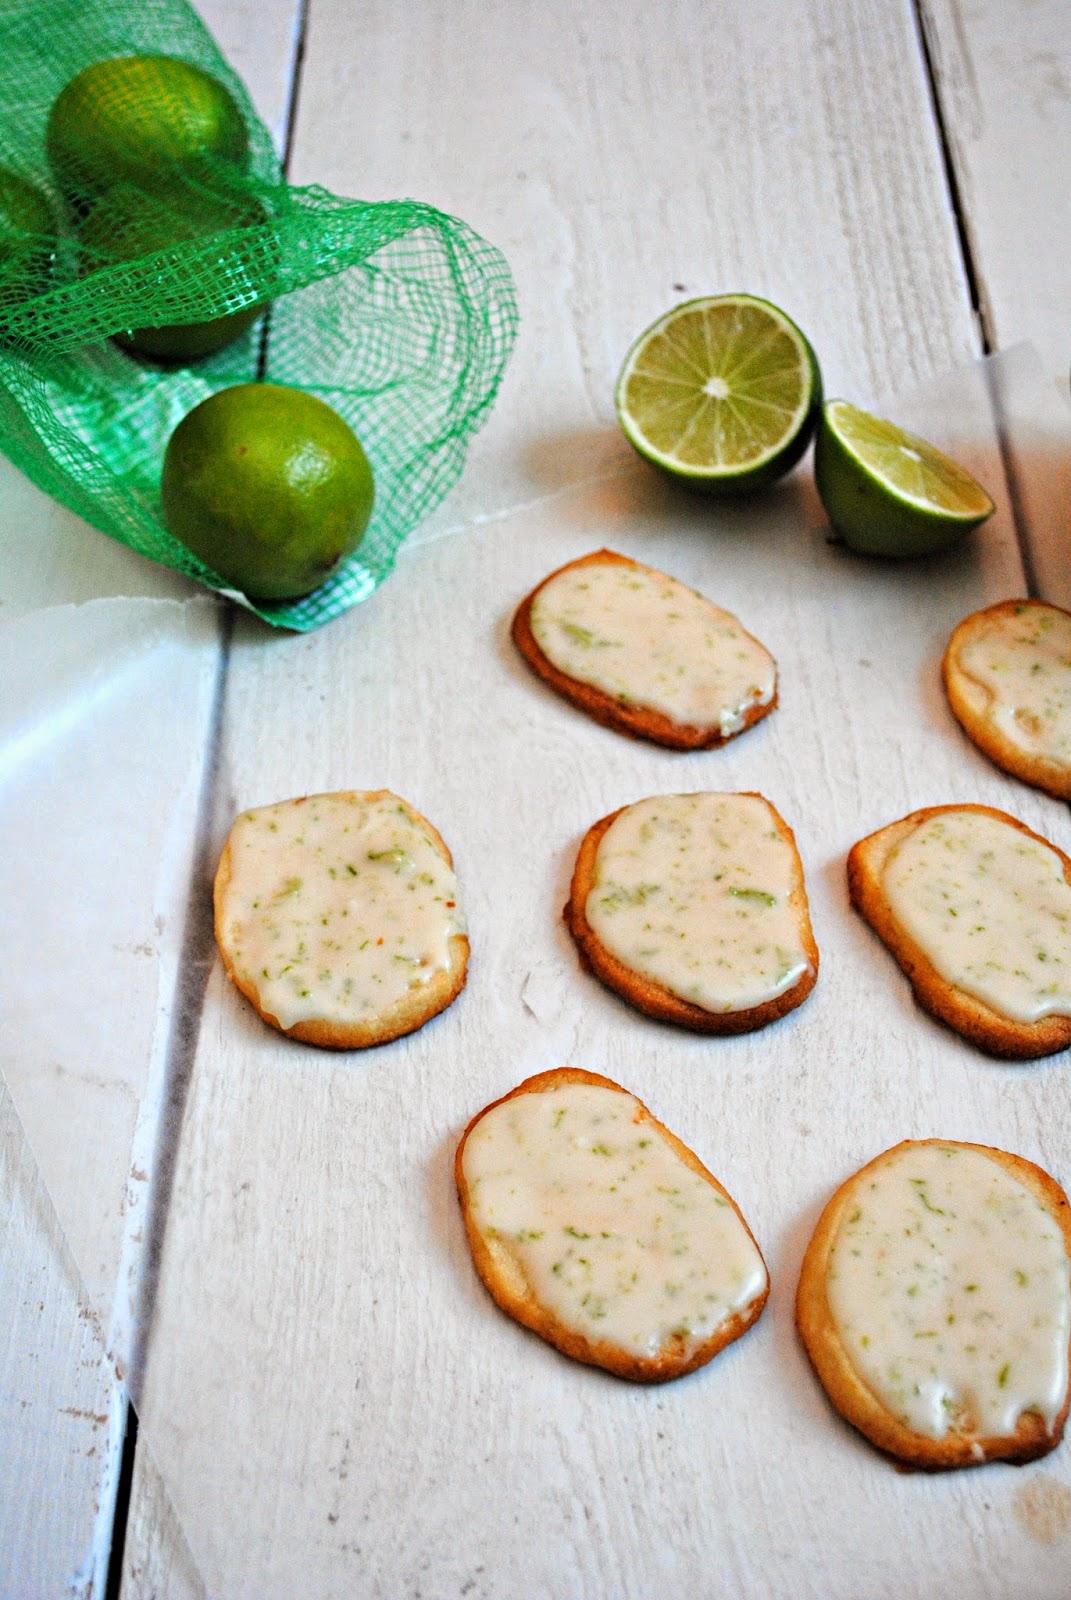 Clove of Garlic, A Pinch of Salt: I'm Here! + Lime-Glazed Cookies